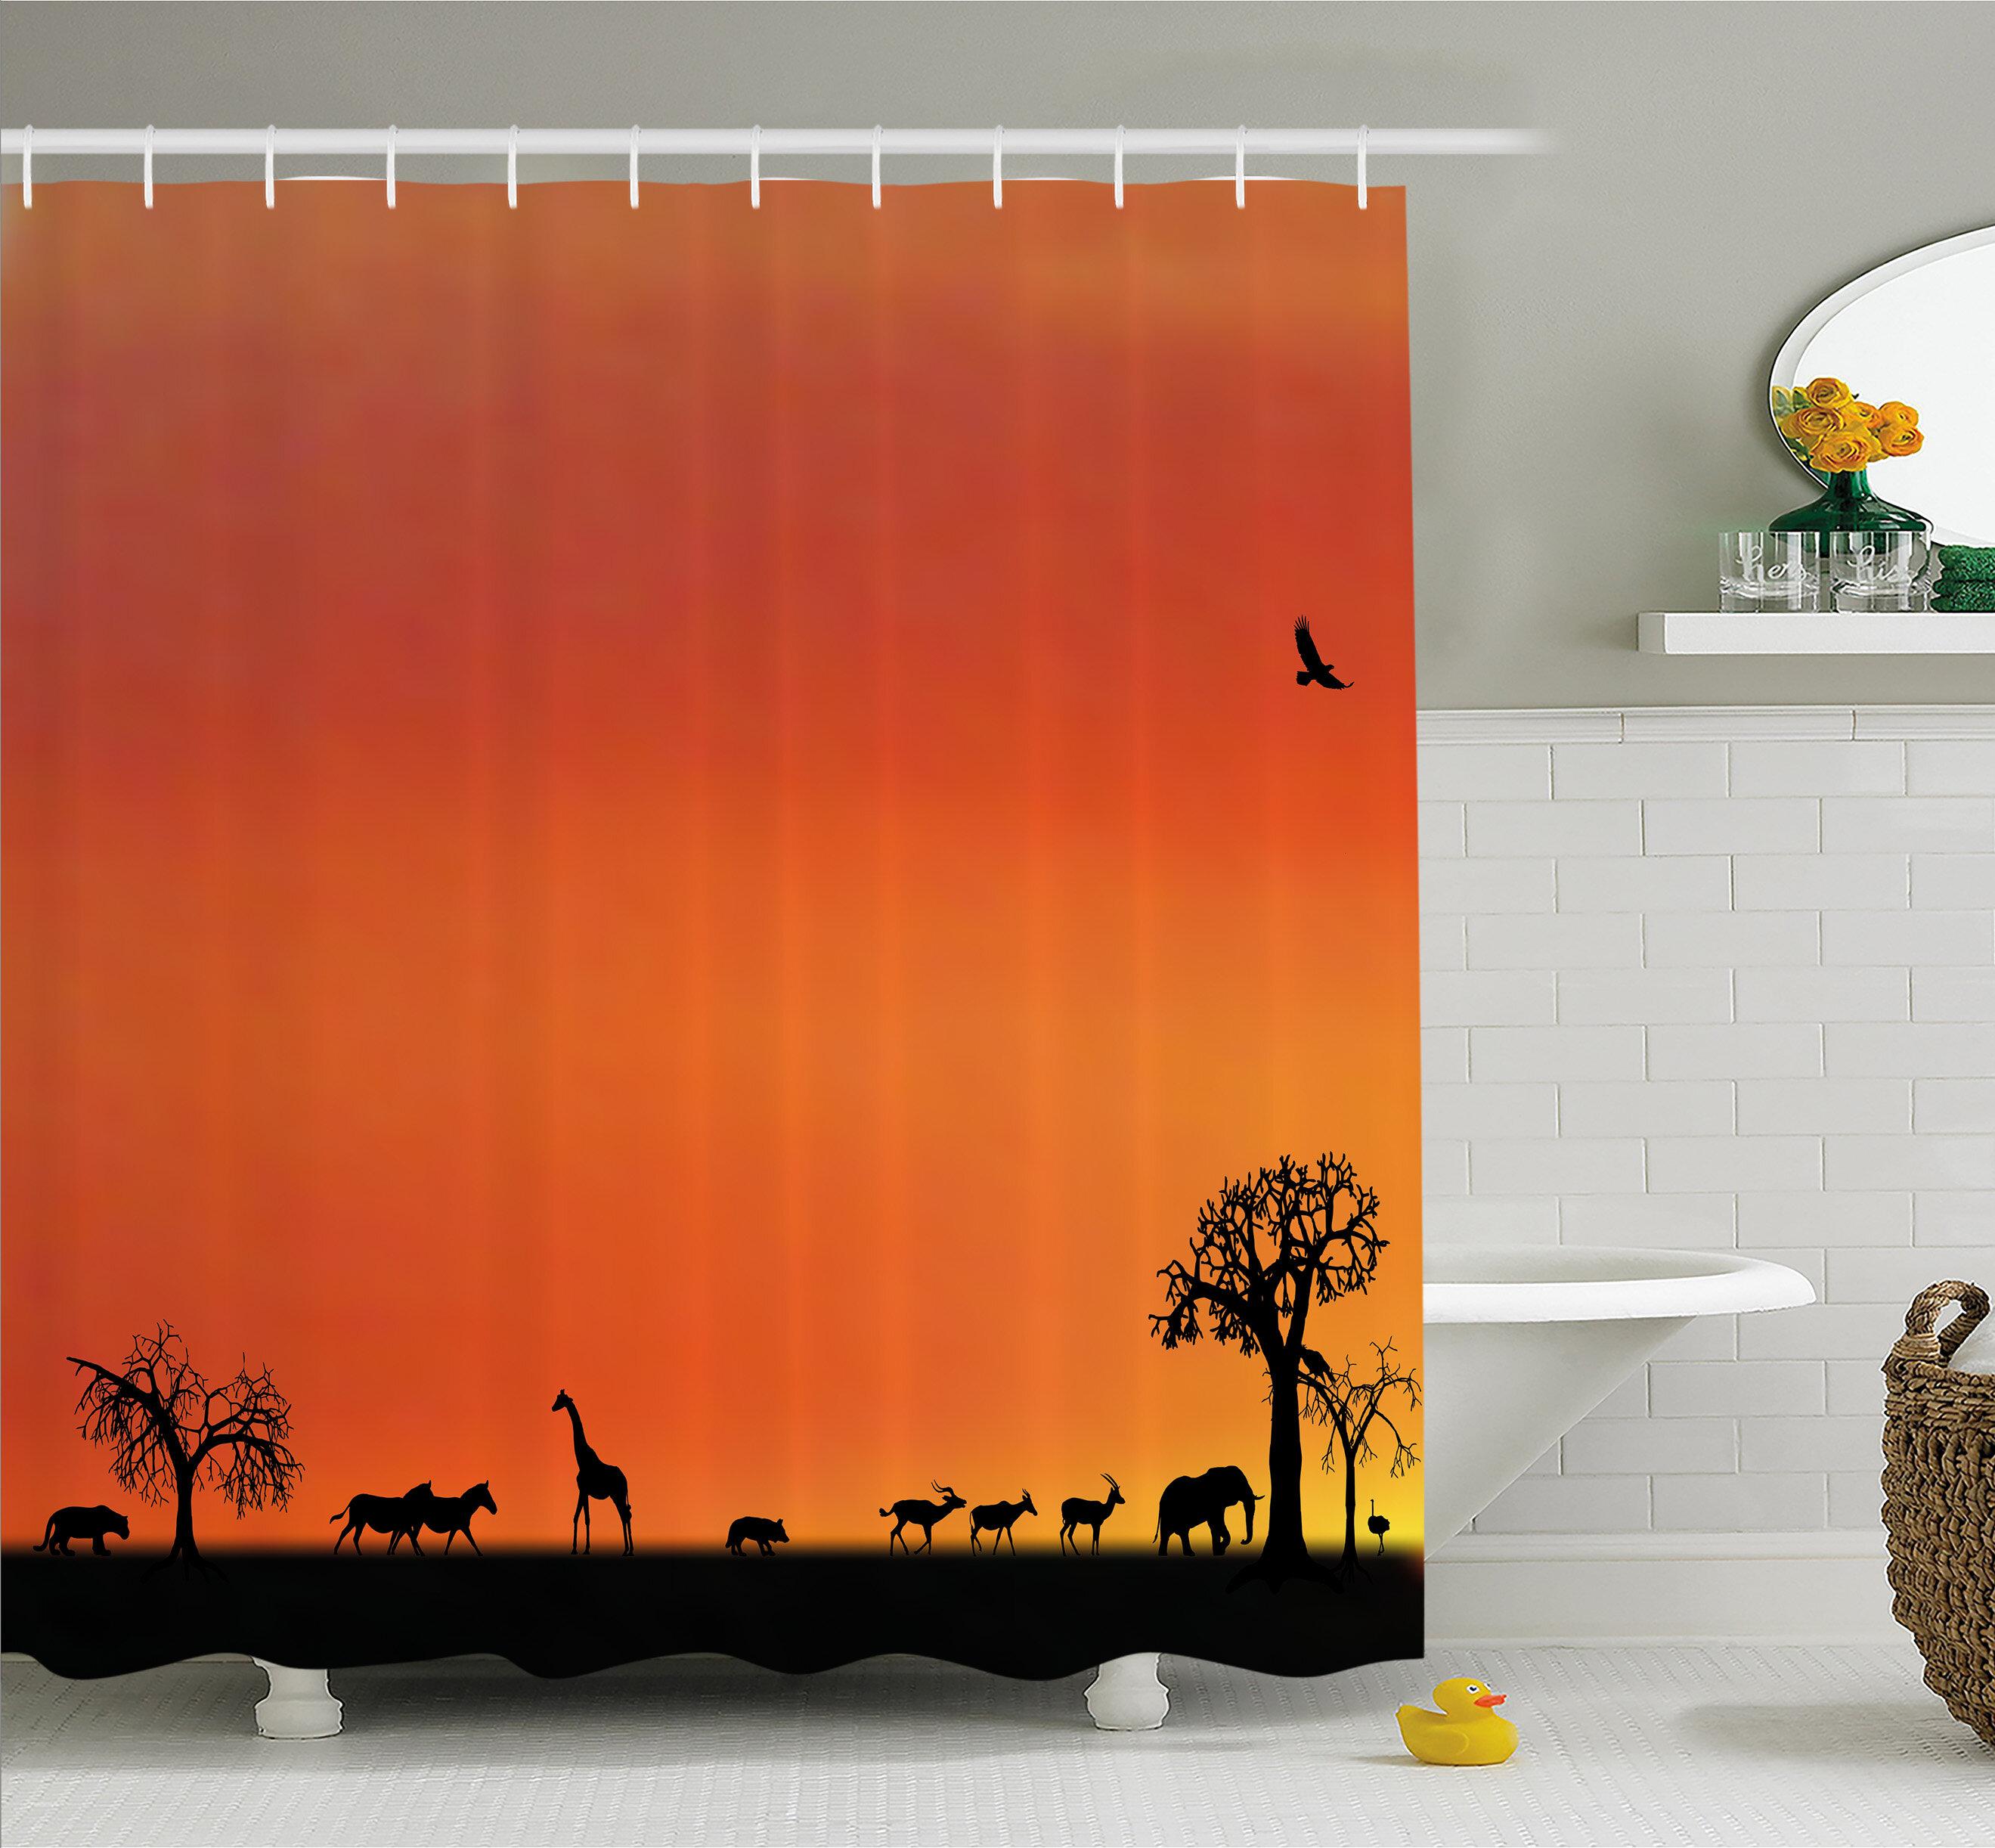 East Urban Home Wildlife Panorama Of Safari Animals Gulls Reflections In Background At Sunset Shower Curtain Set Wayfair